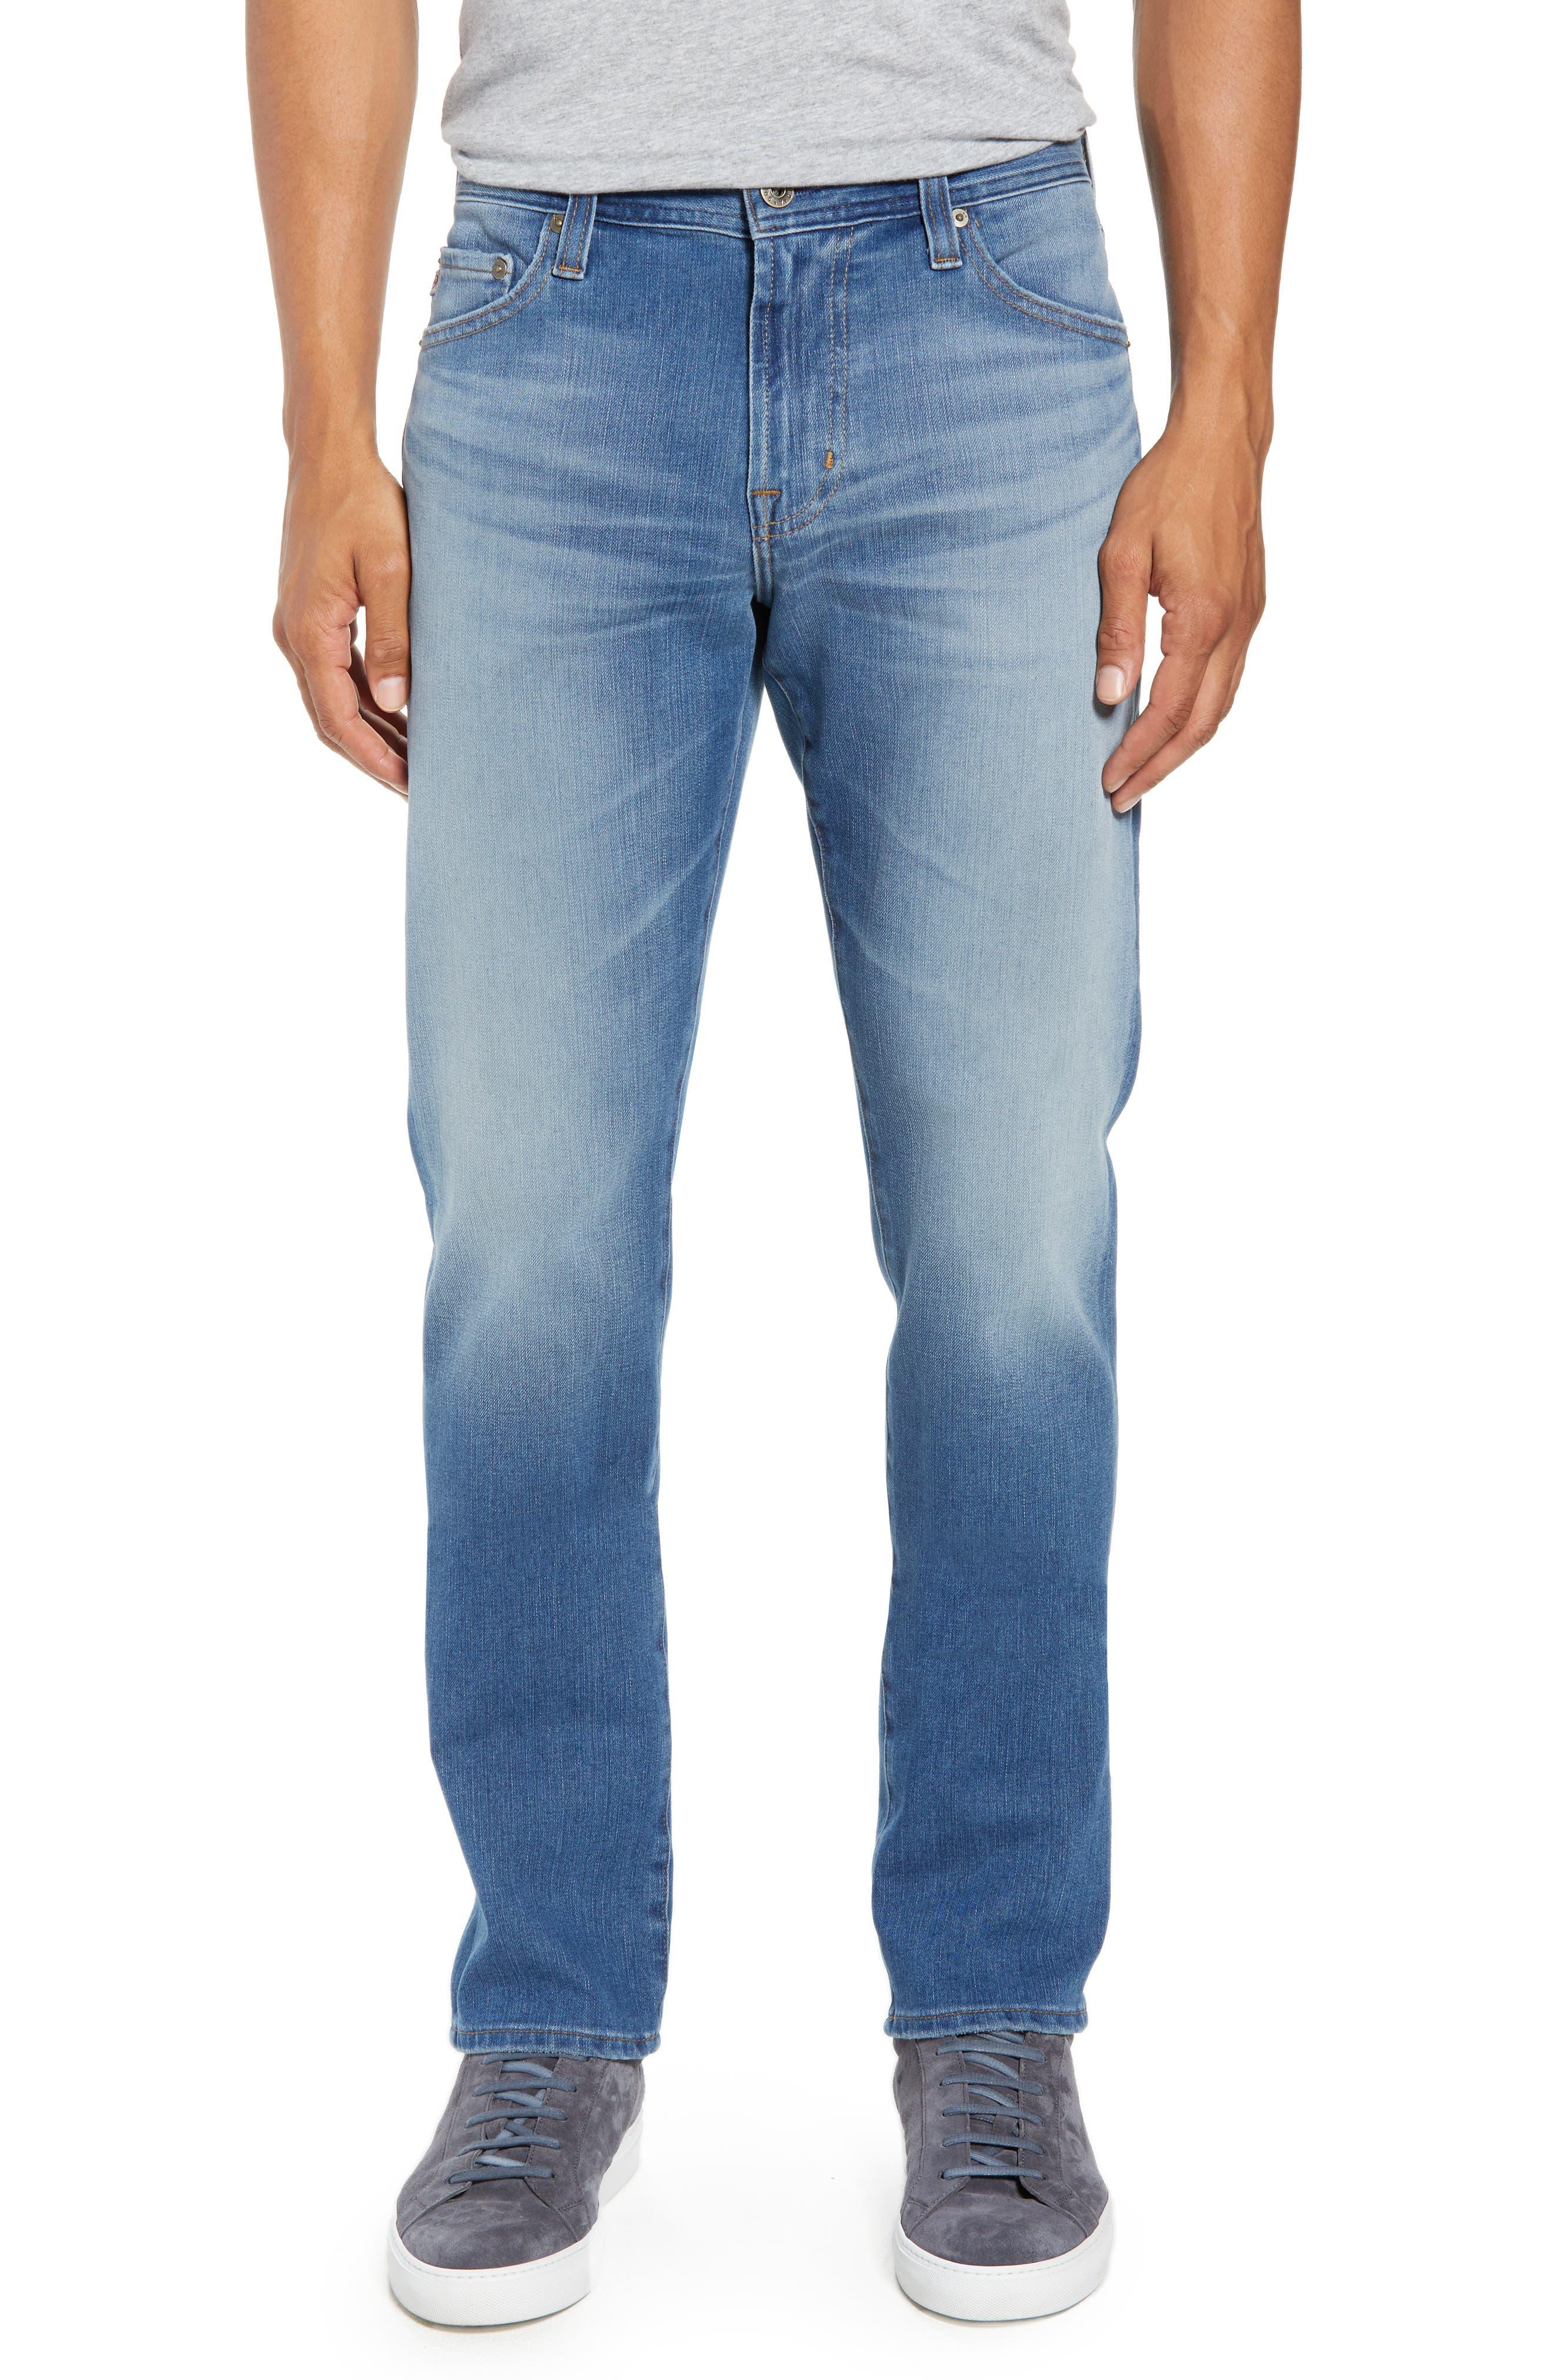 Everett Slim Straight Leg Jeans,                             Main thumbnail 1, color,                             Merchant